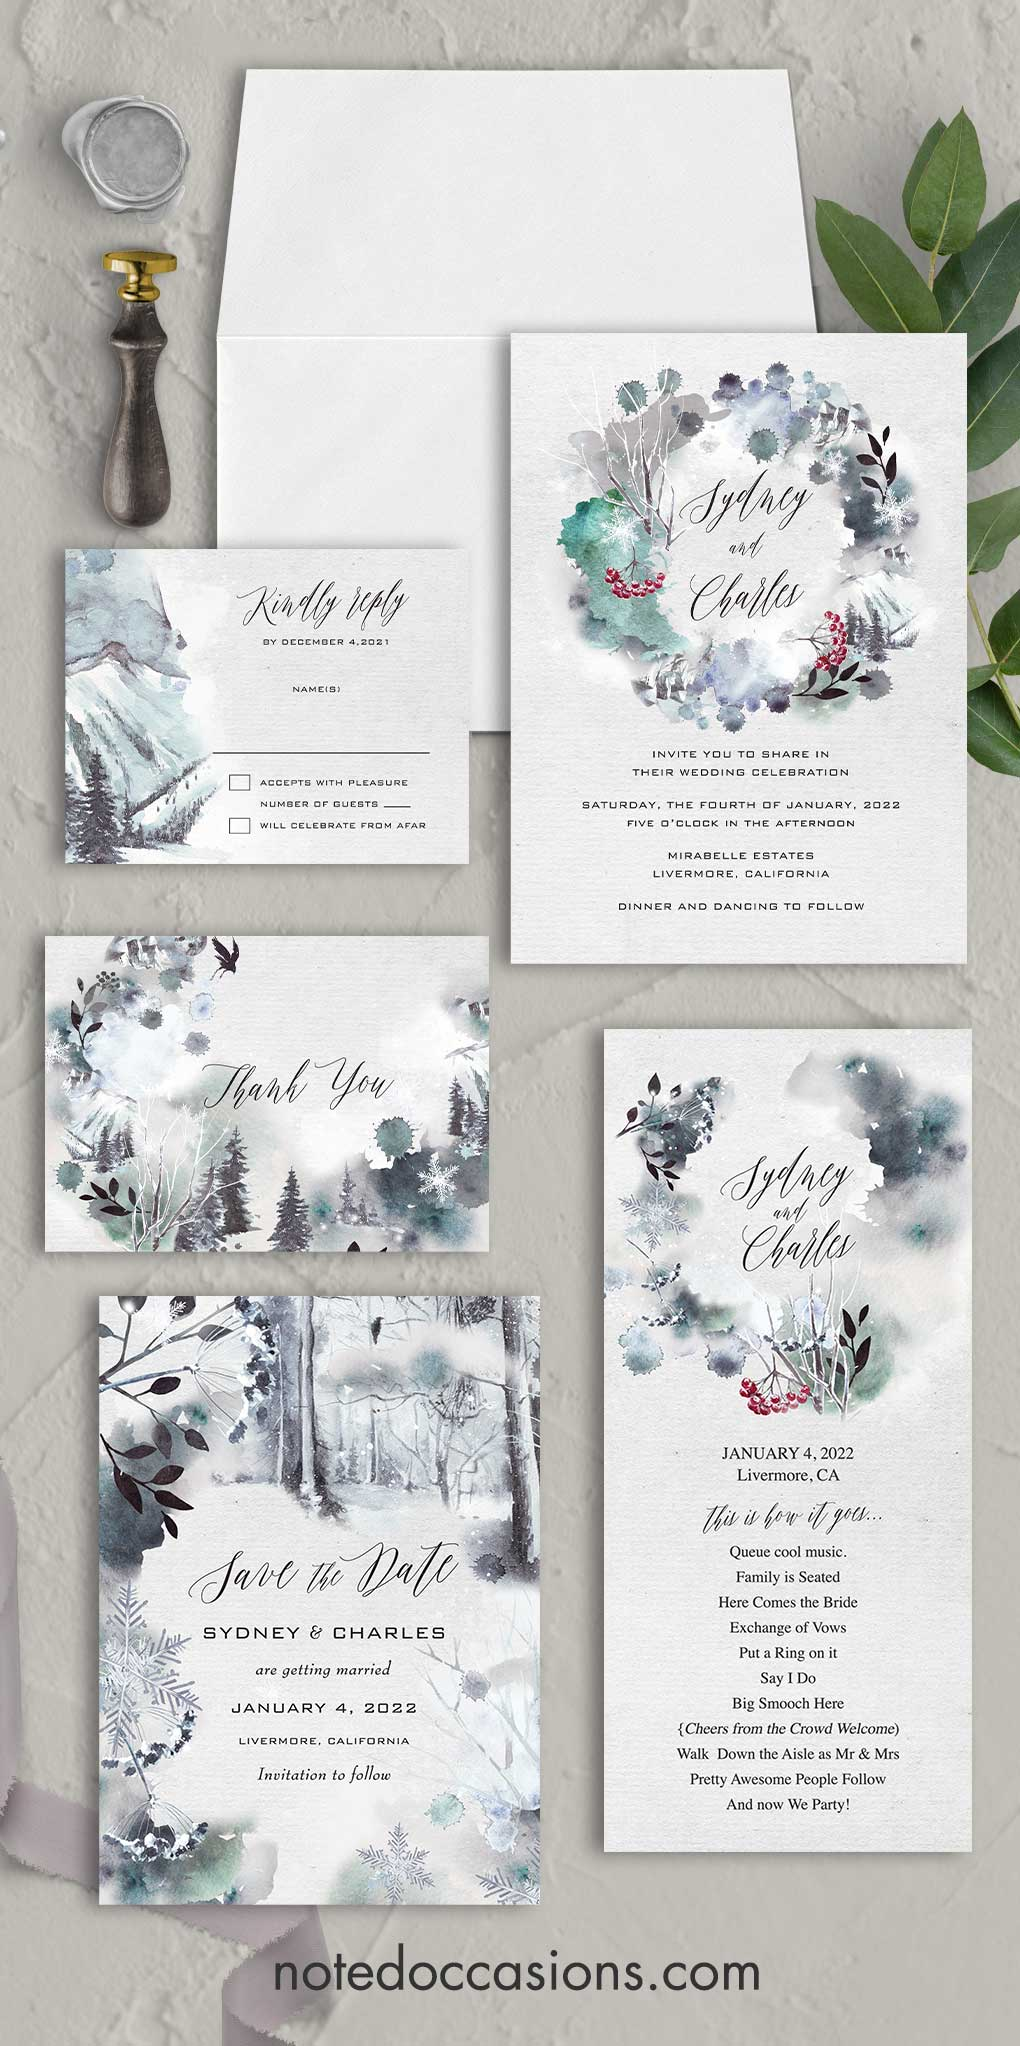 Winter Wedding Tree Wedding Winter Invite Outdoor Nature Wedding Forest Wedding Invitation Christmas Rustic Wedding Collection 039